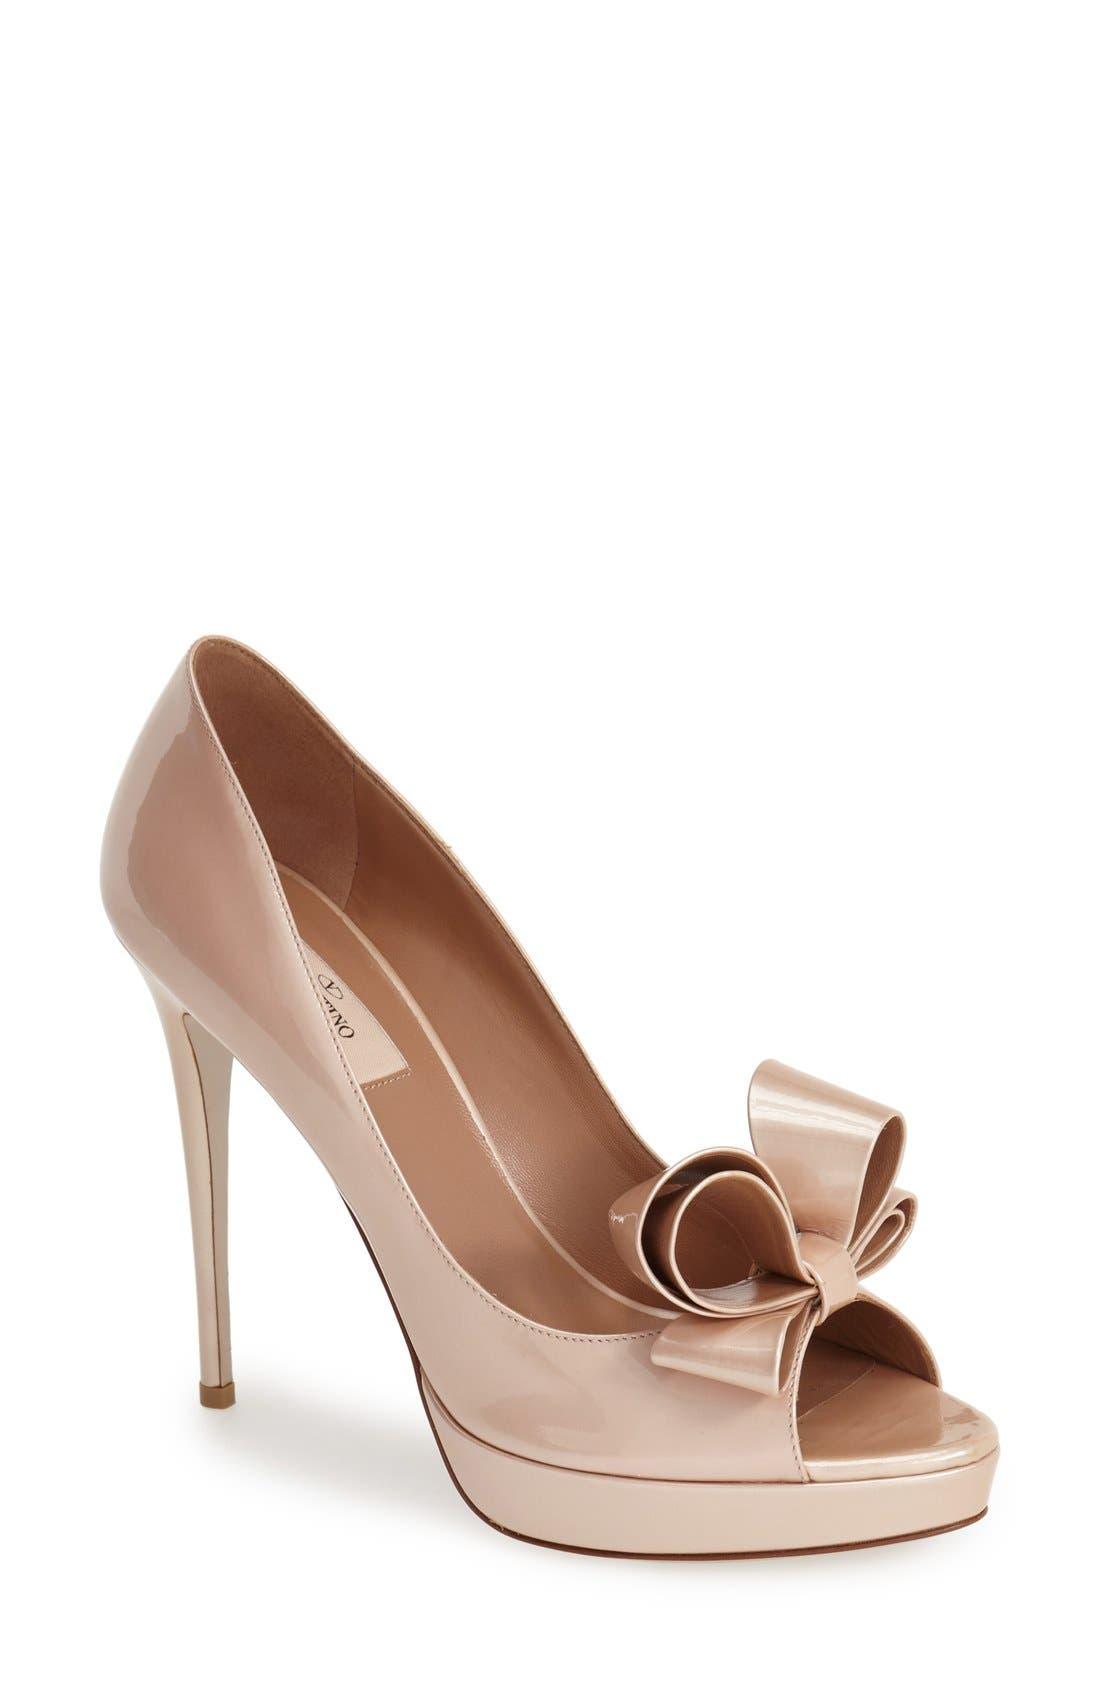 Main Image - Valentino Couture Bow Platform Pump (Women)